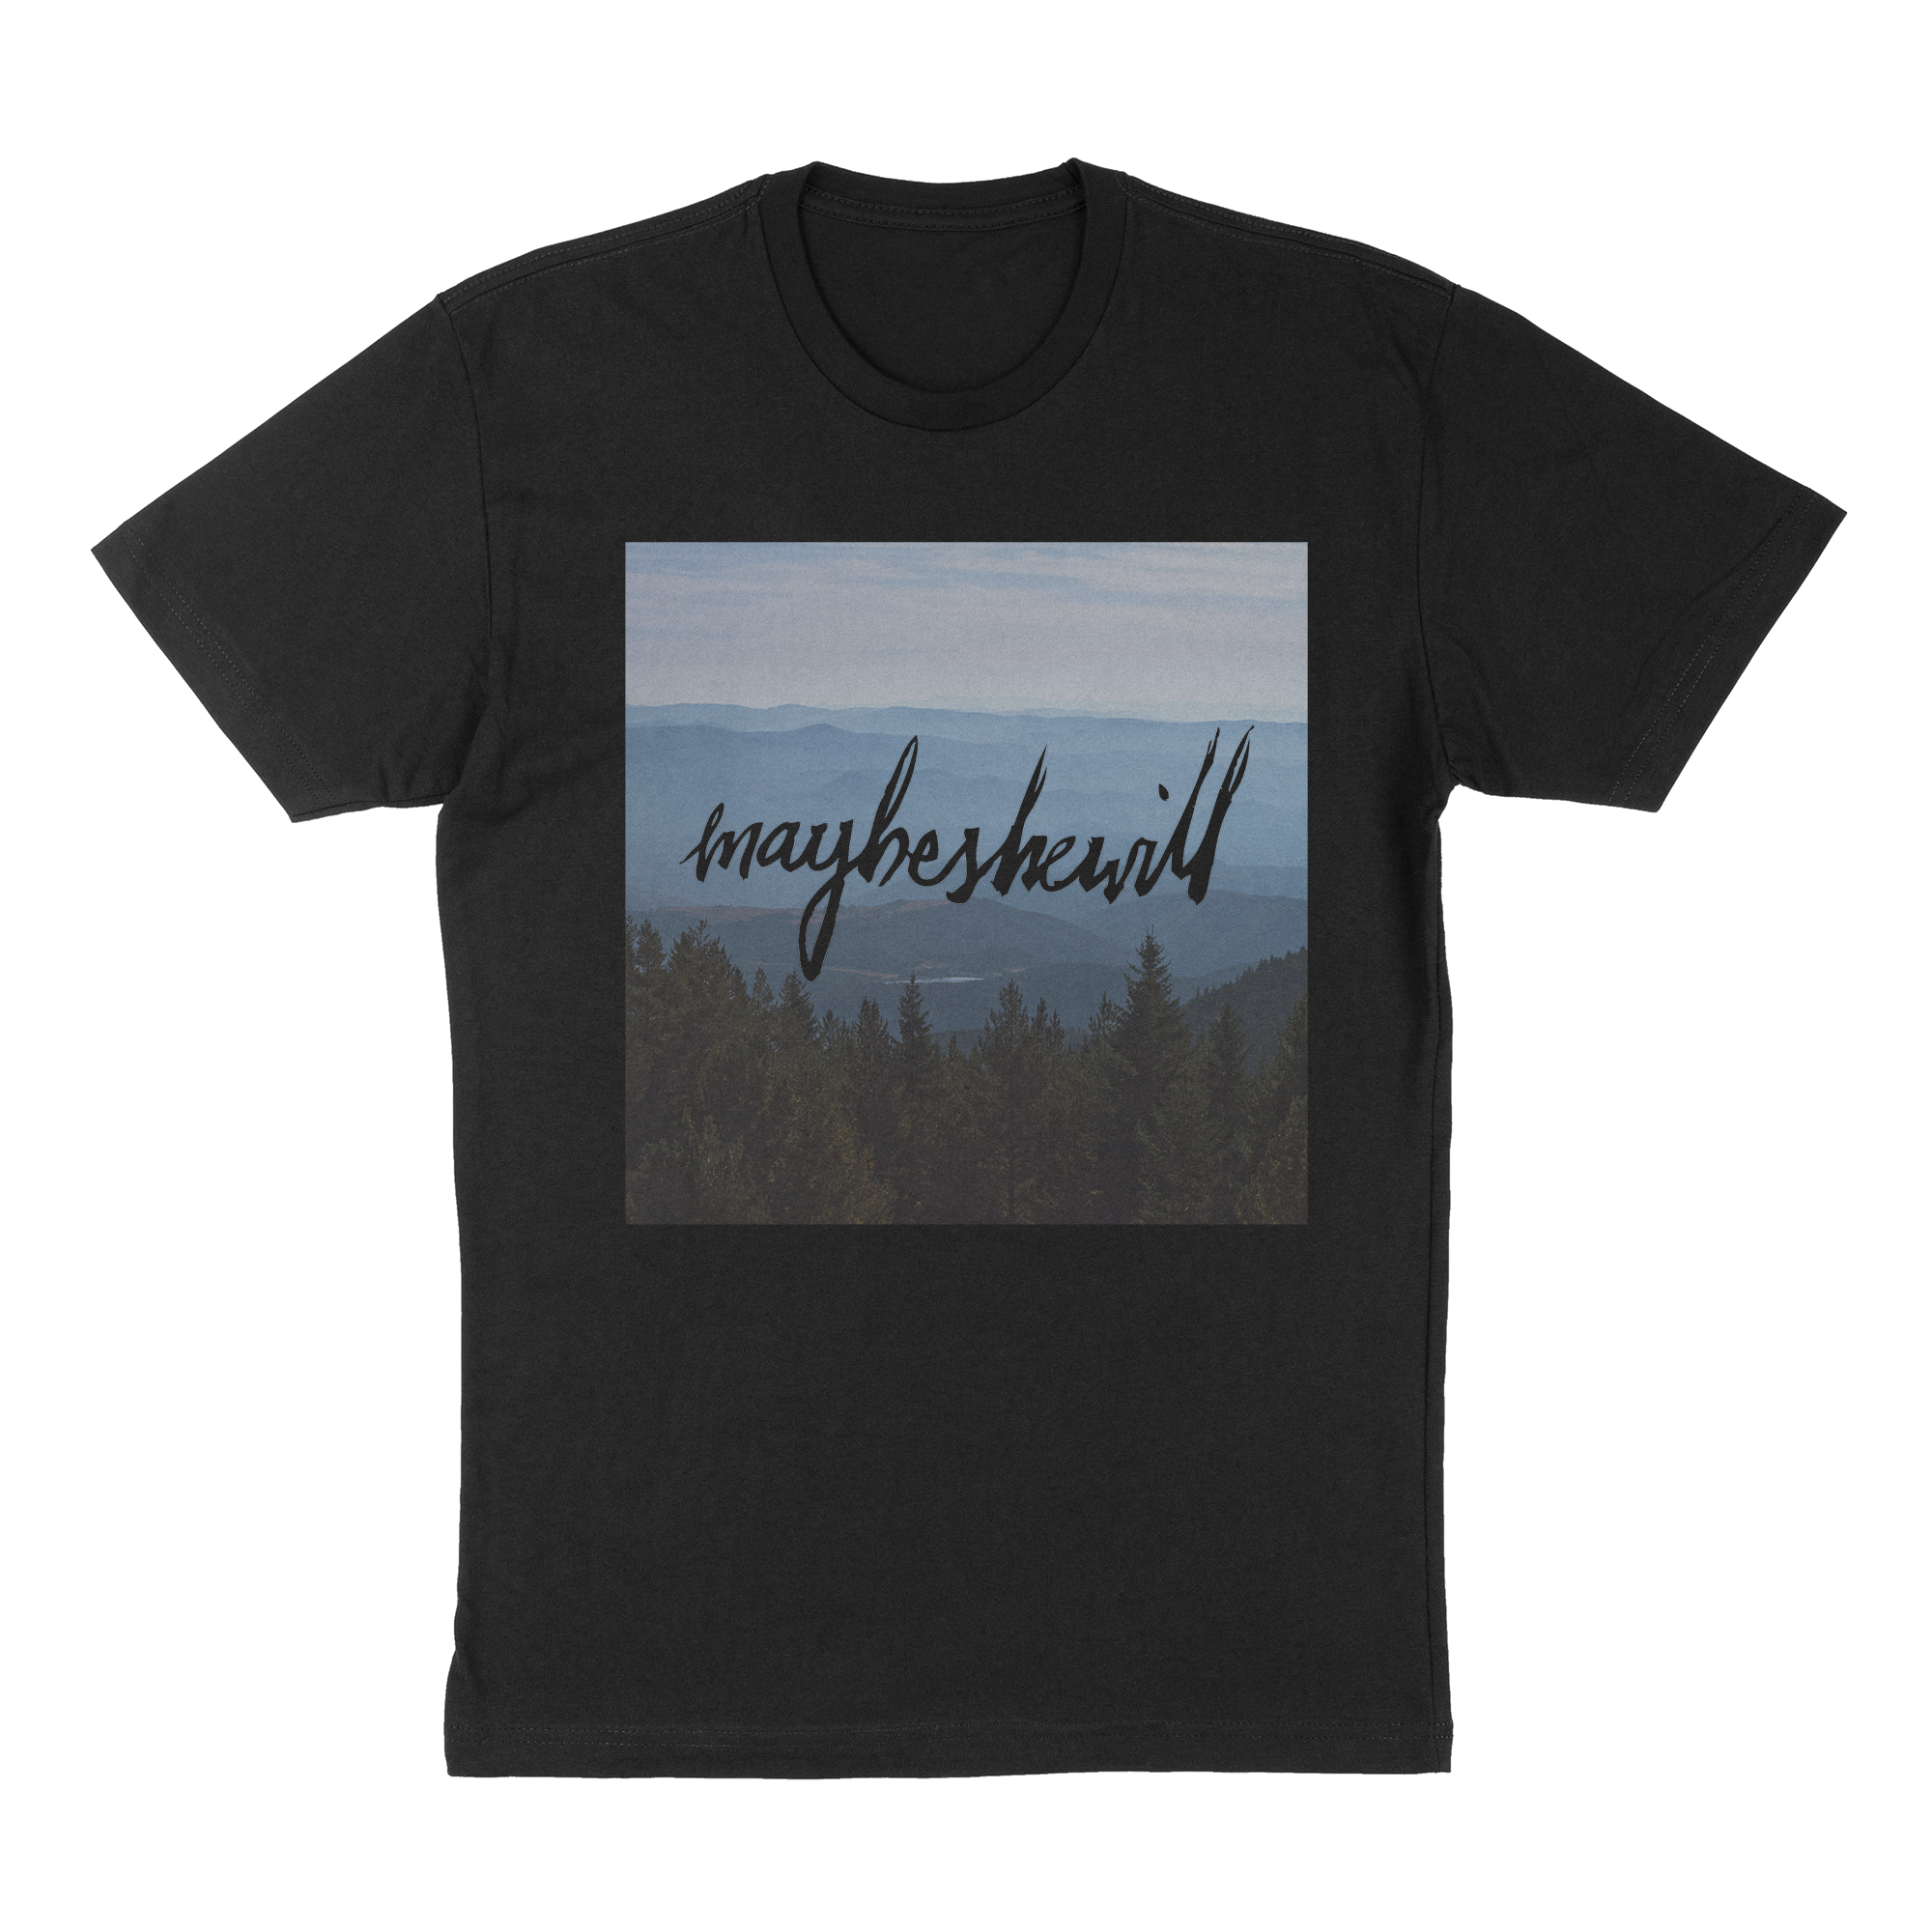 Maybeshewill -- No Feeling is Final Shirt Bundle